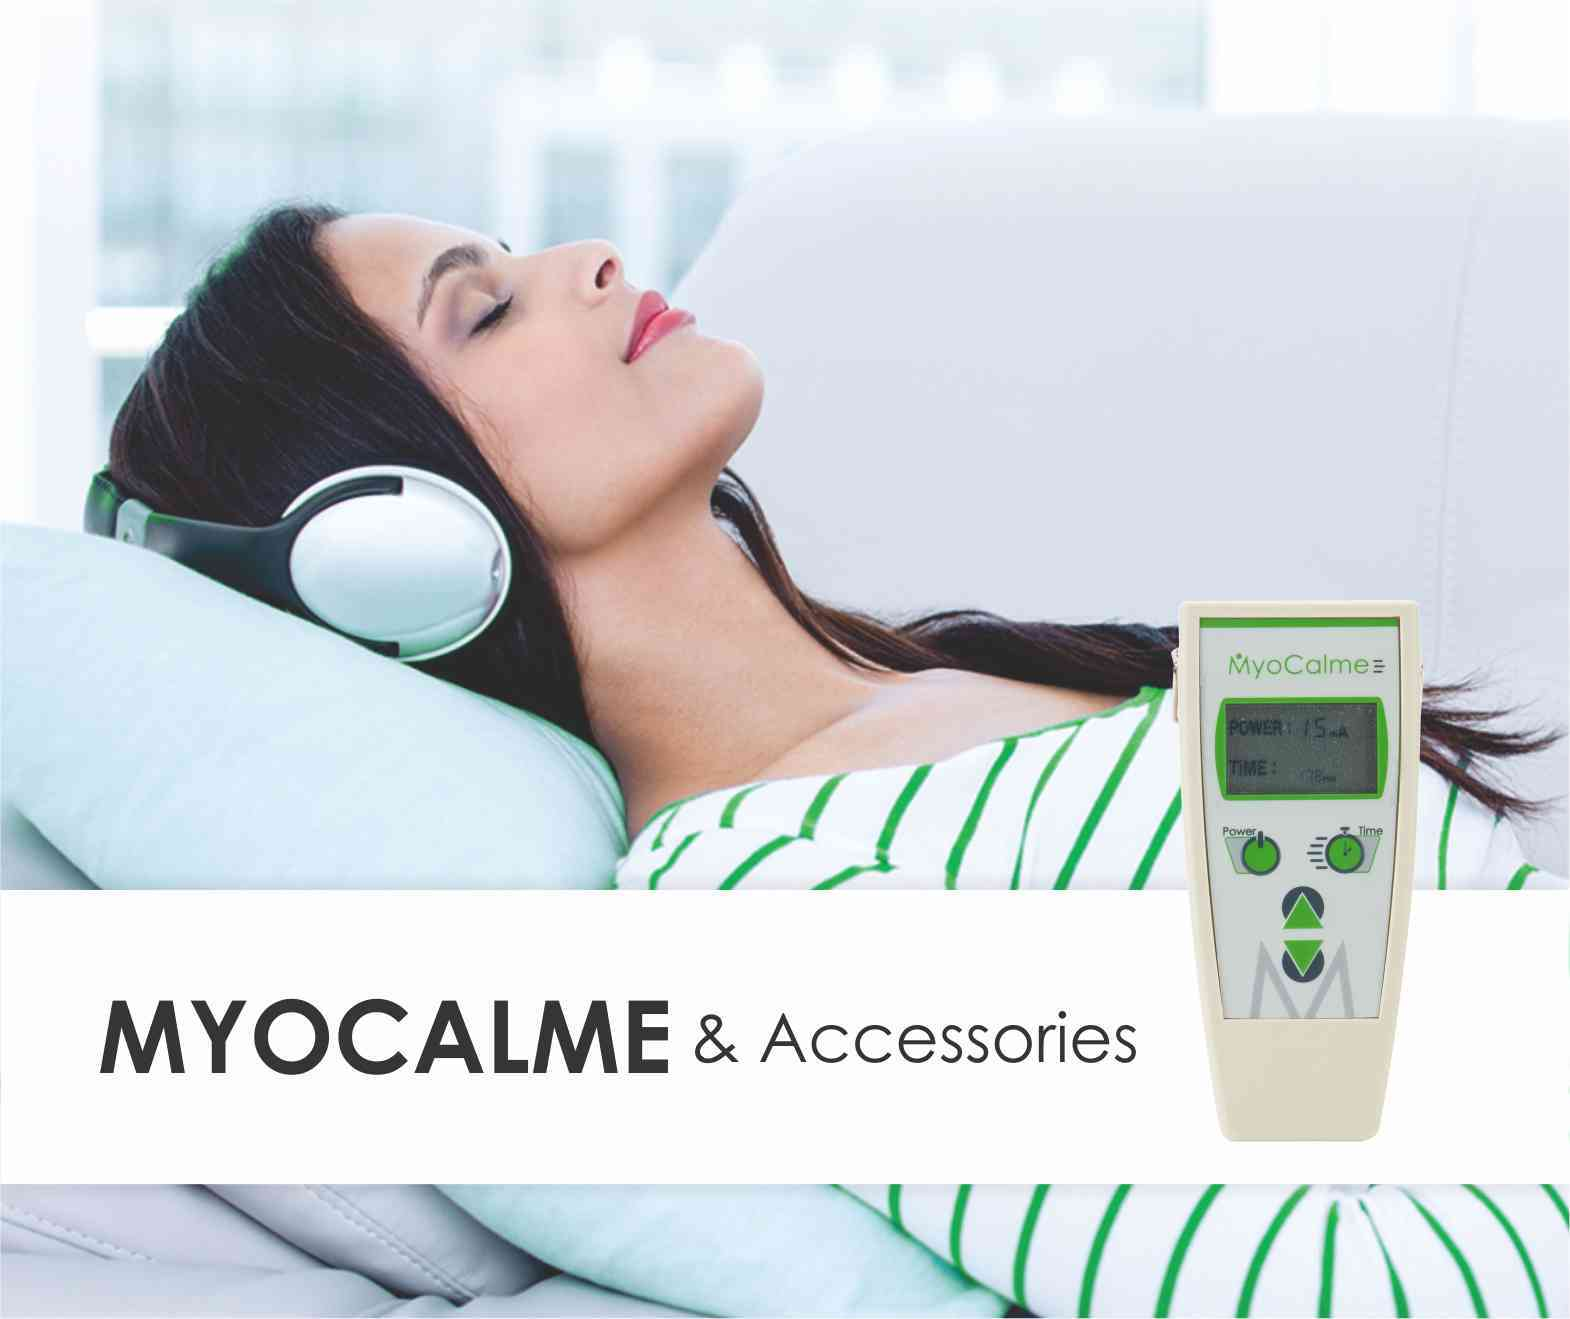 Myocalme and accessories